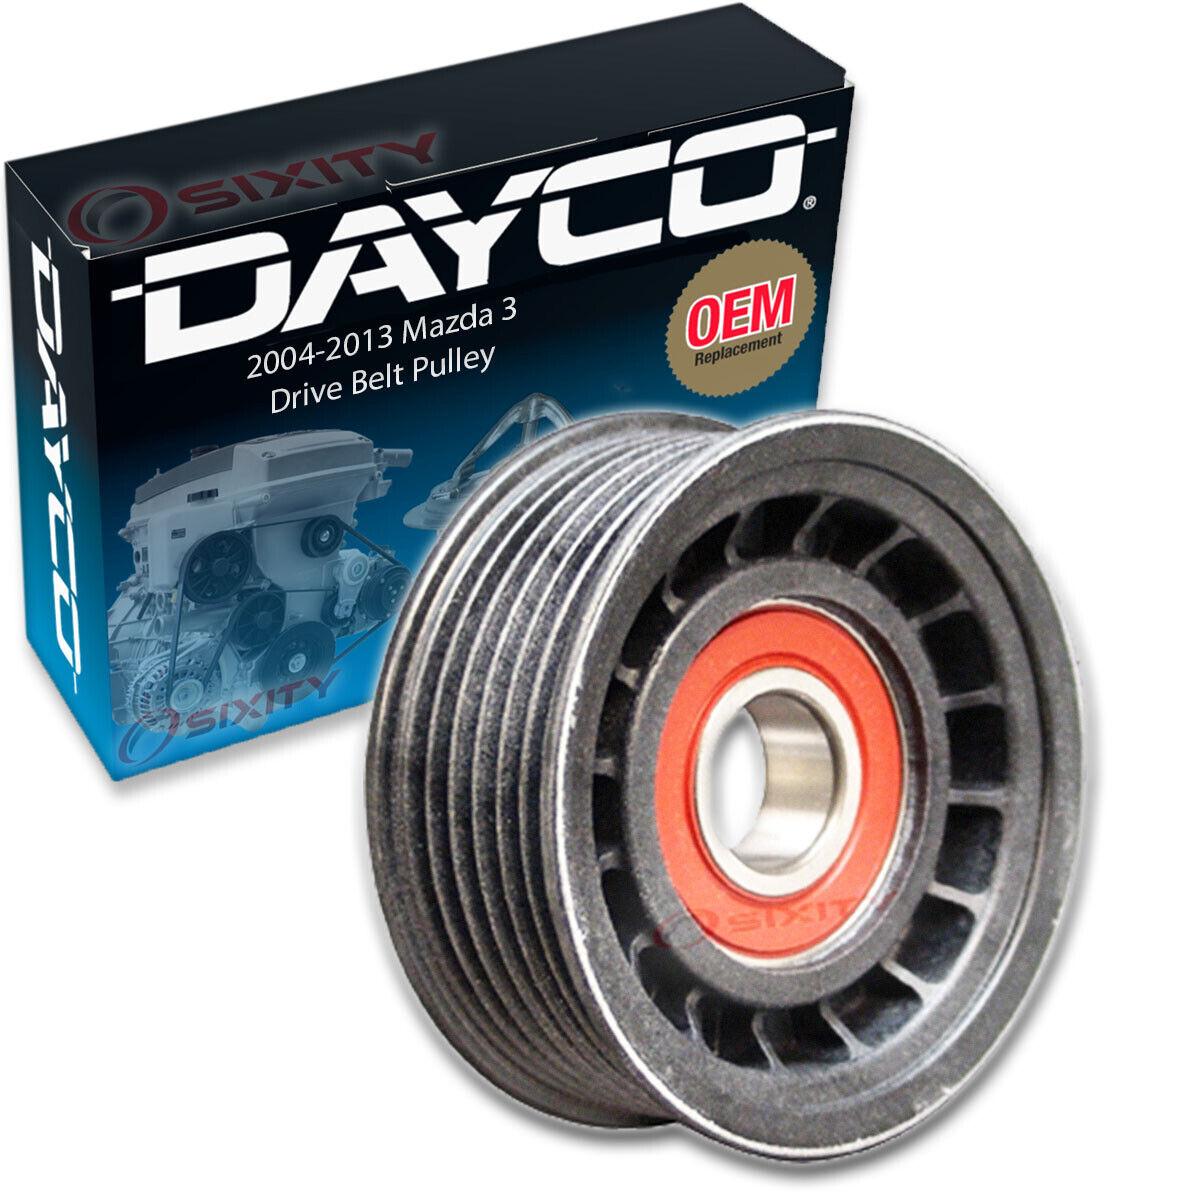 Dayco 89462 Belt Tensioner